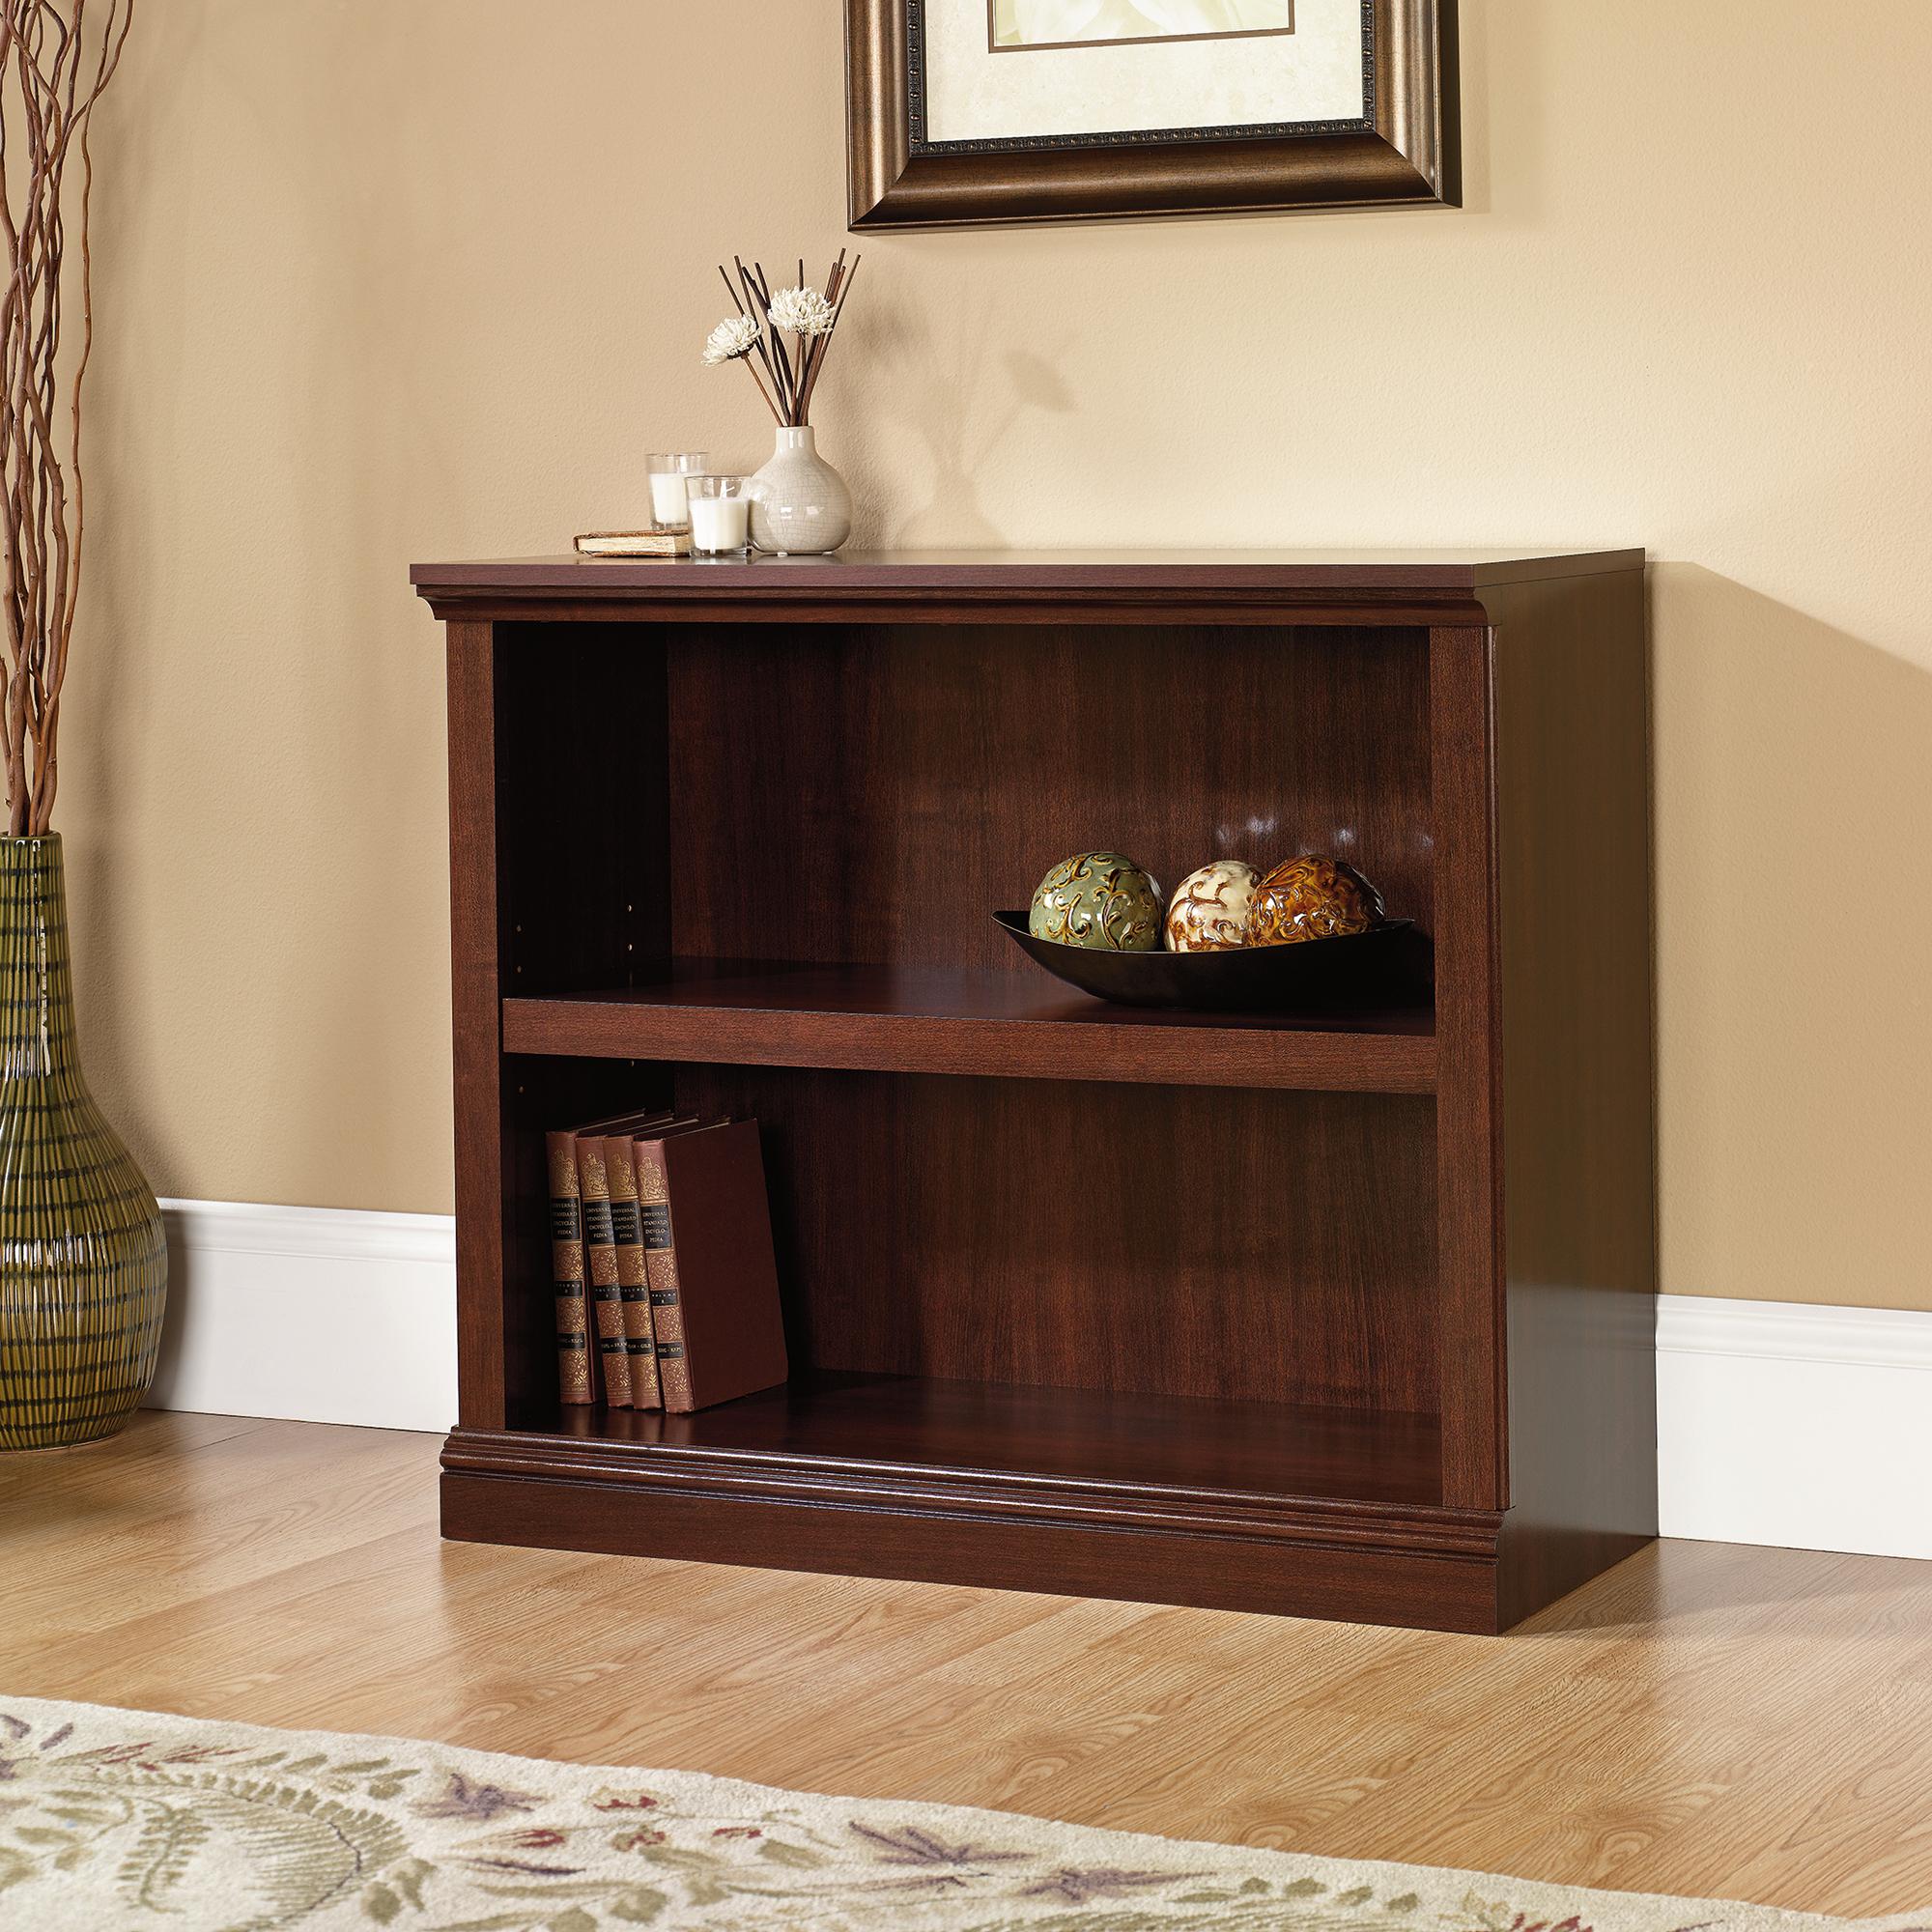 Beautiful 2-Shelf Bookcase; 2-Shelf Bookcase sauder 2 shelf bookcase